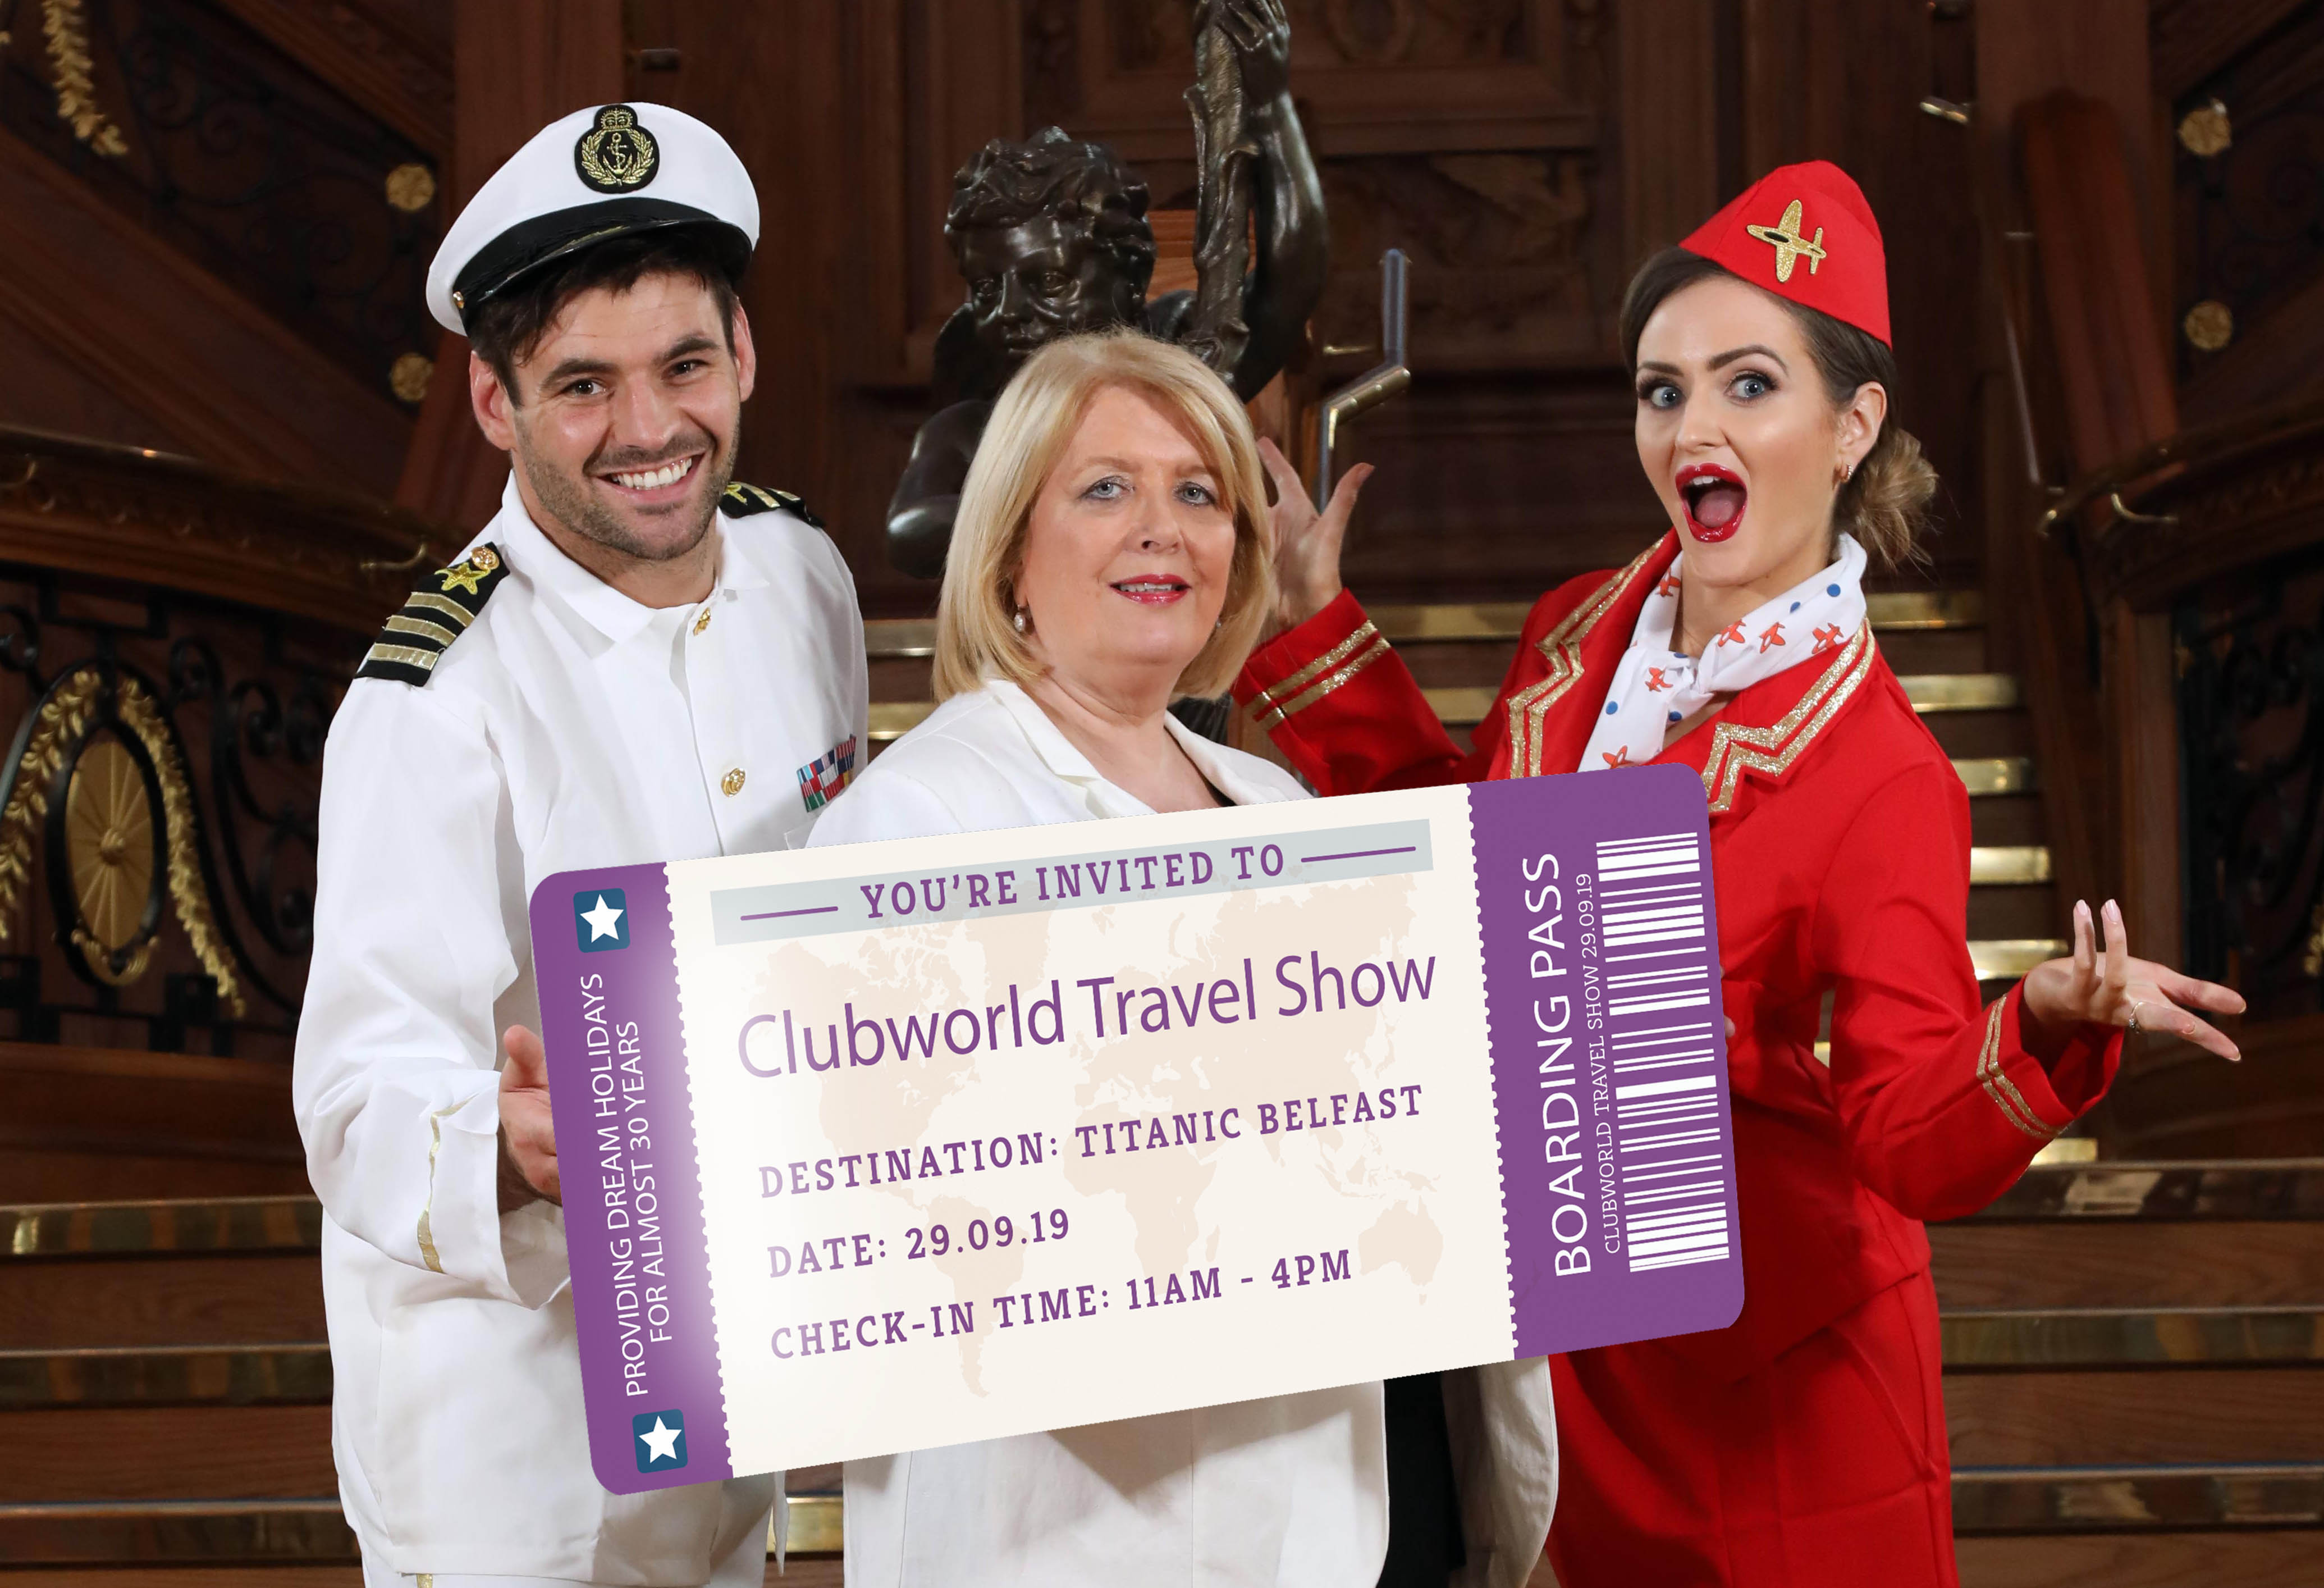 Clubworld Travel Showcase 1